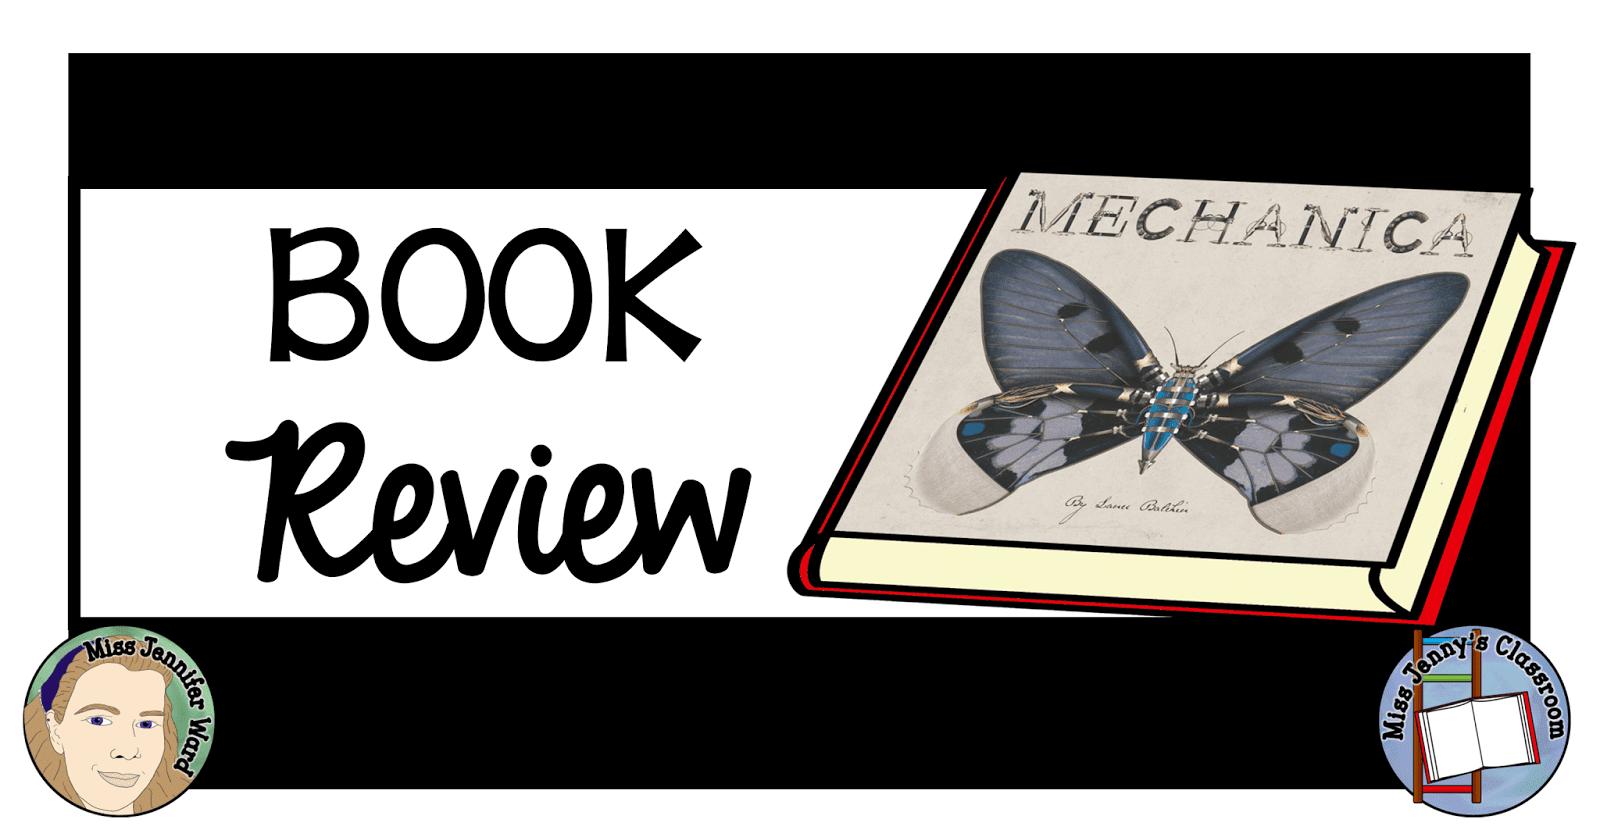 Mechanica: Book Review